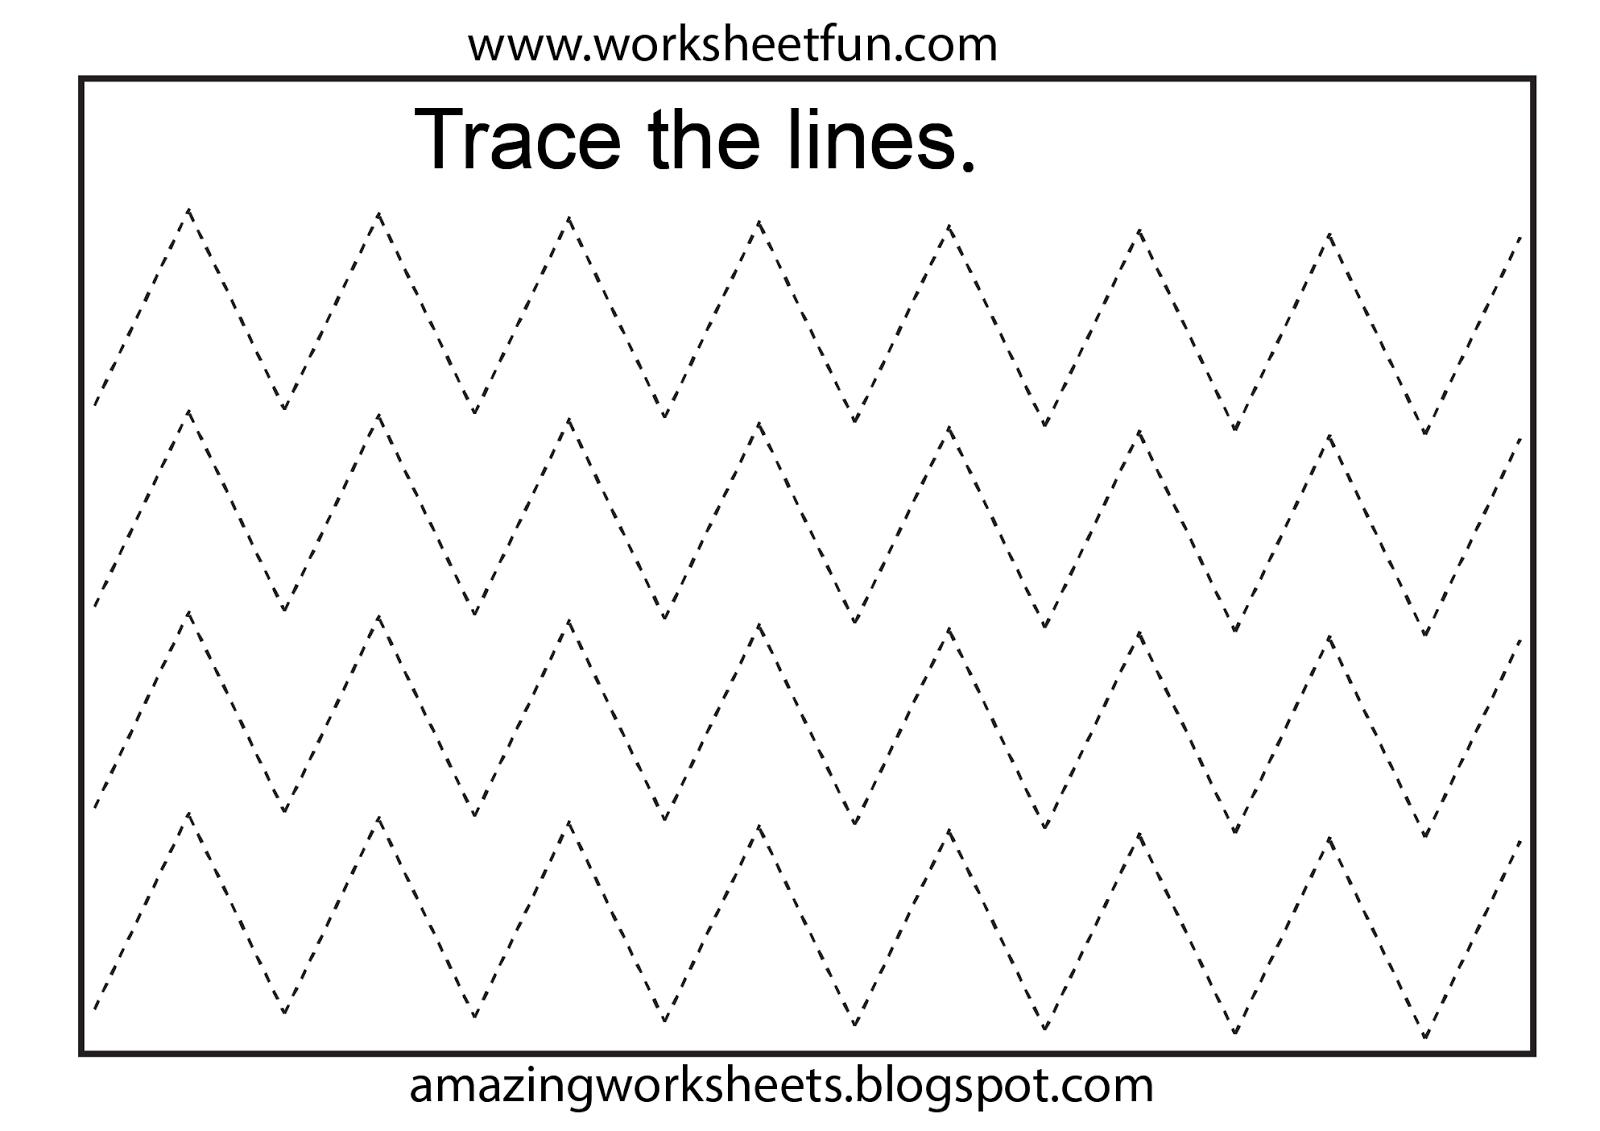 Worksheetfun - Free Printable Worksheets | Toddler Worksheets - Free | Free Printable Tracing Worksheets For Preschoolers